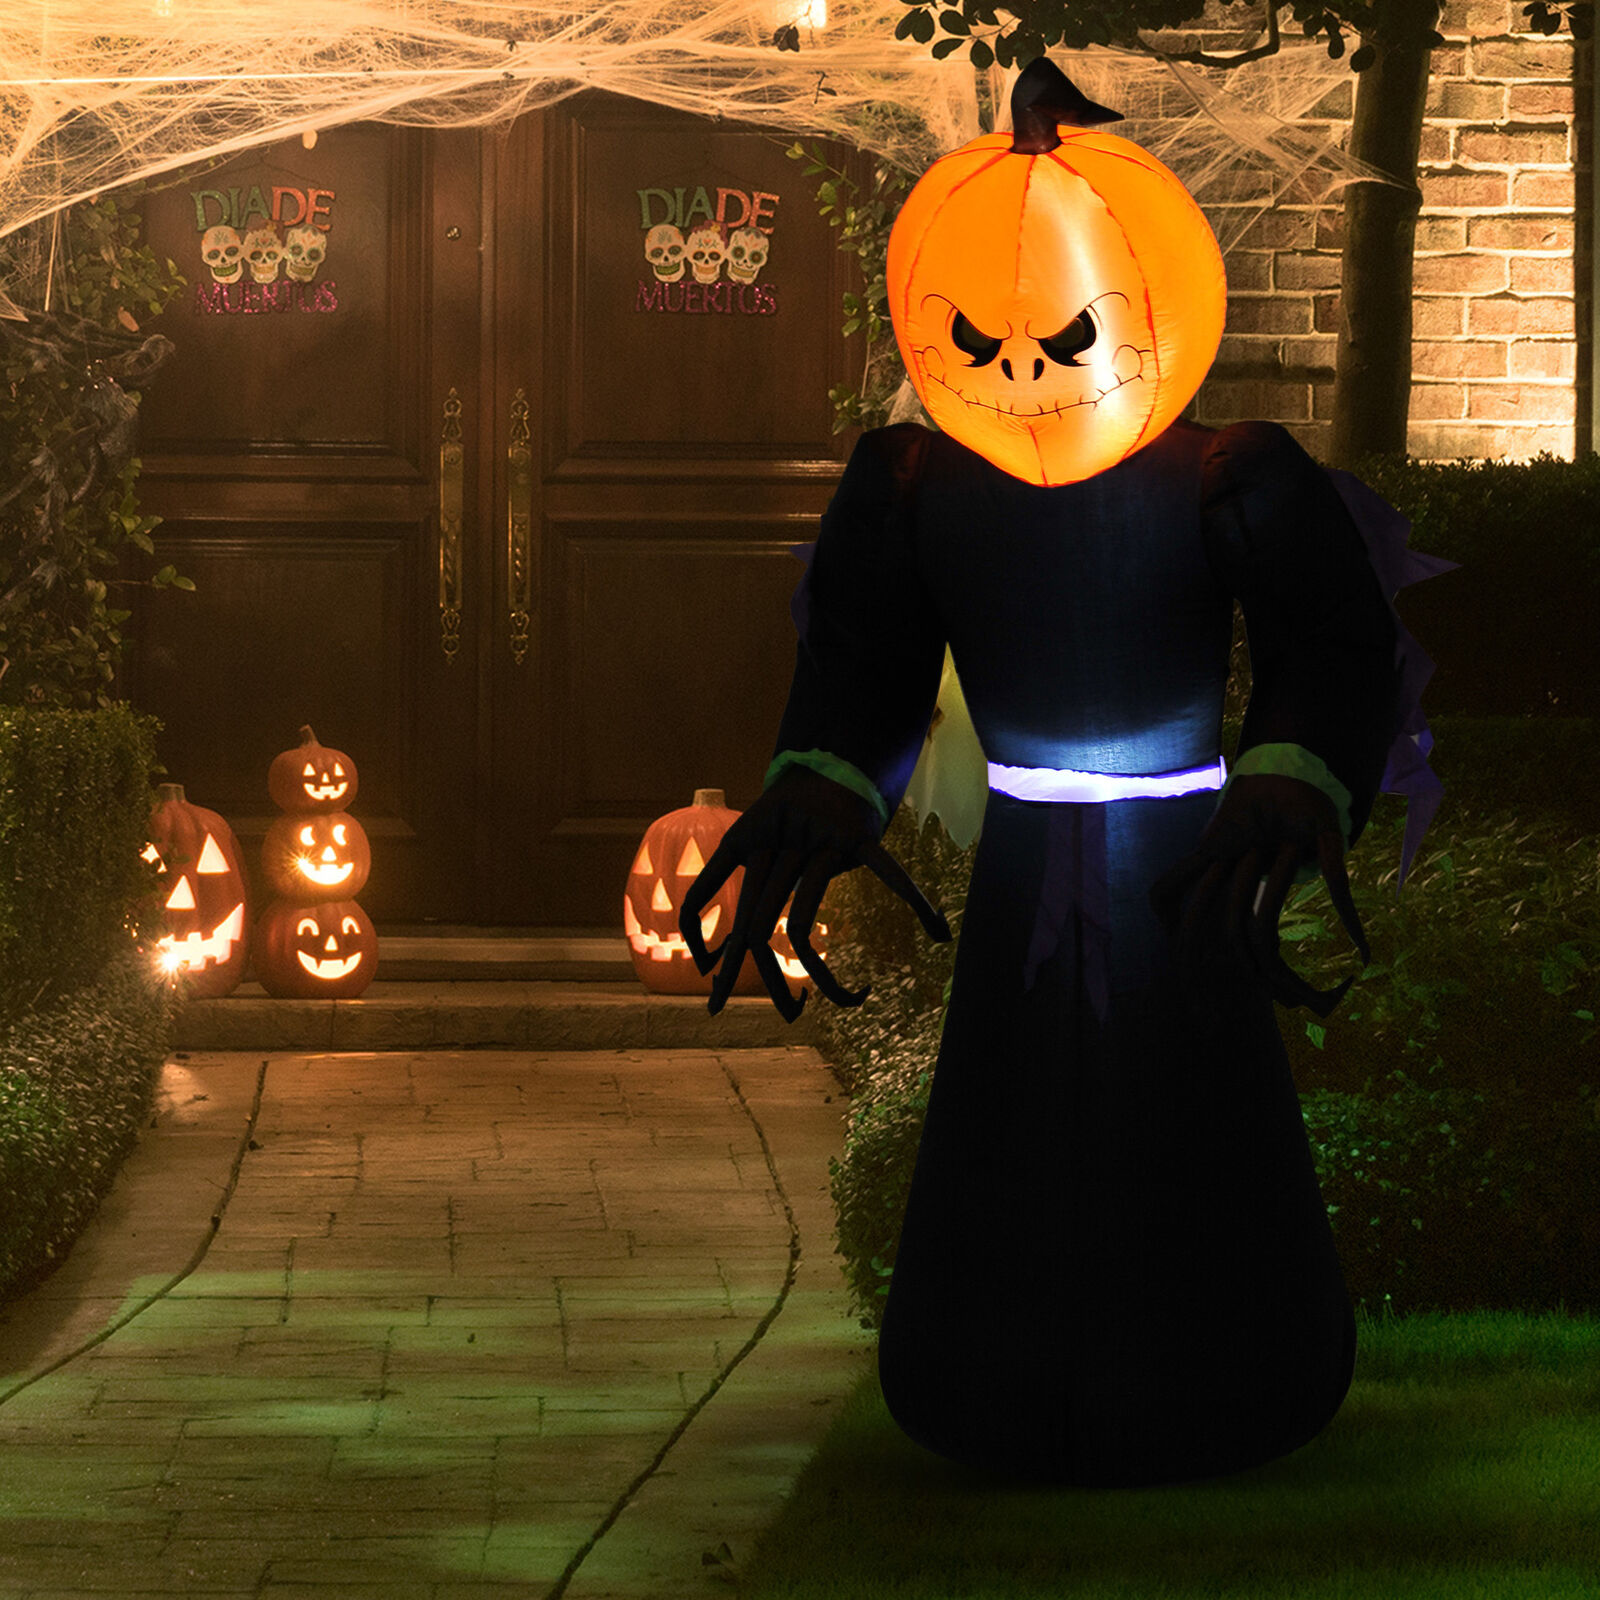 7ft Halloween Airblown Inflatable Pumpkin Reaper Ghost